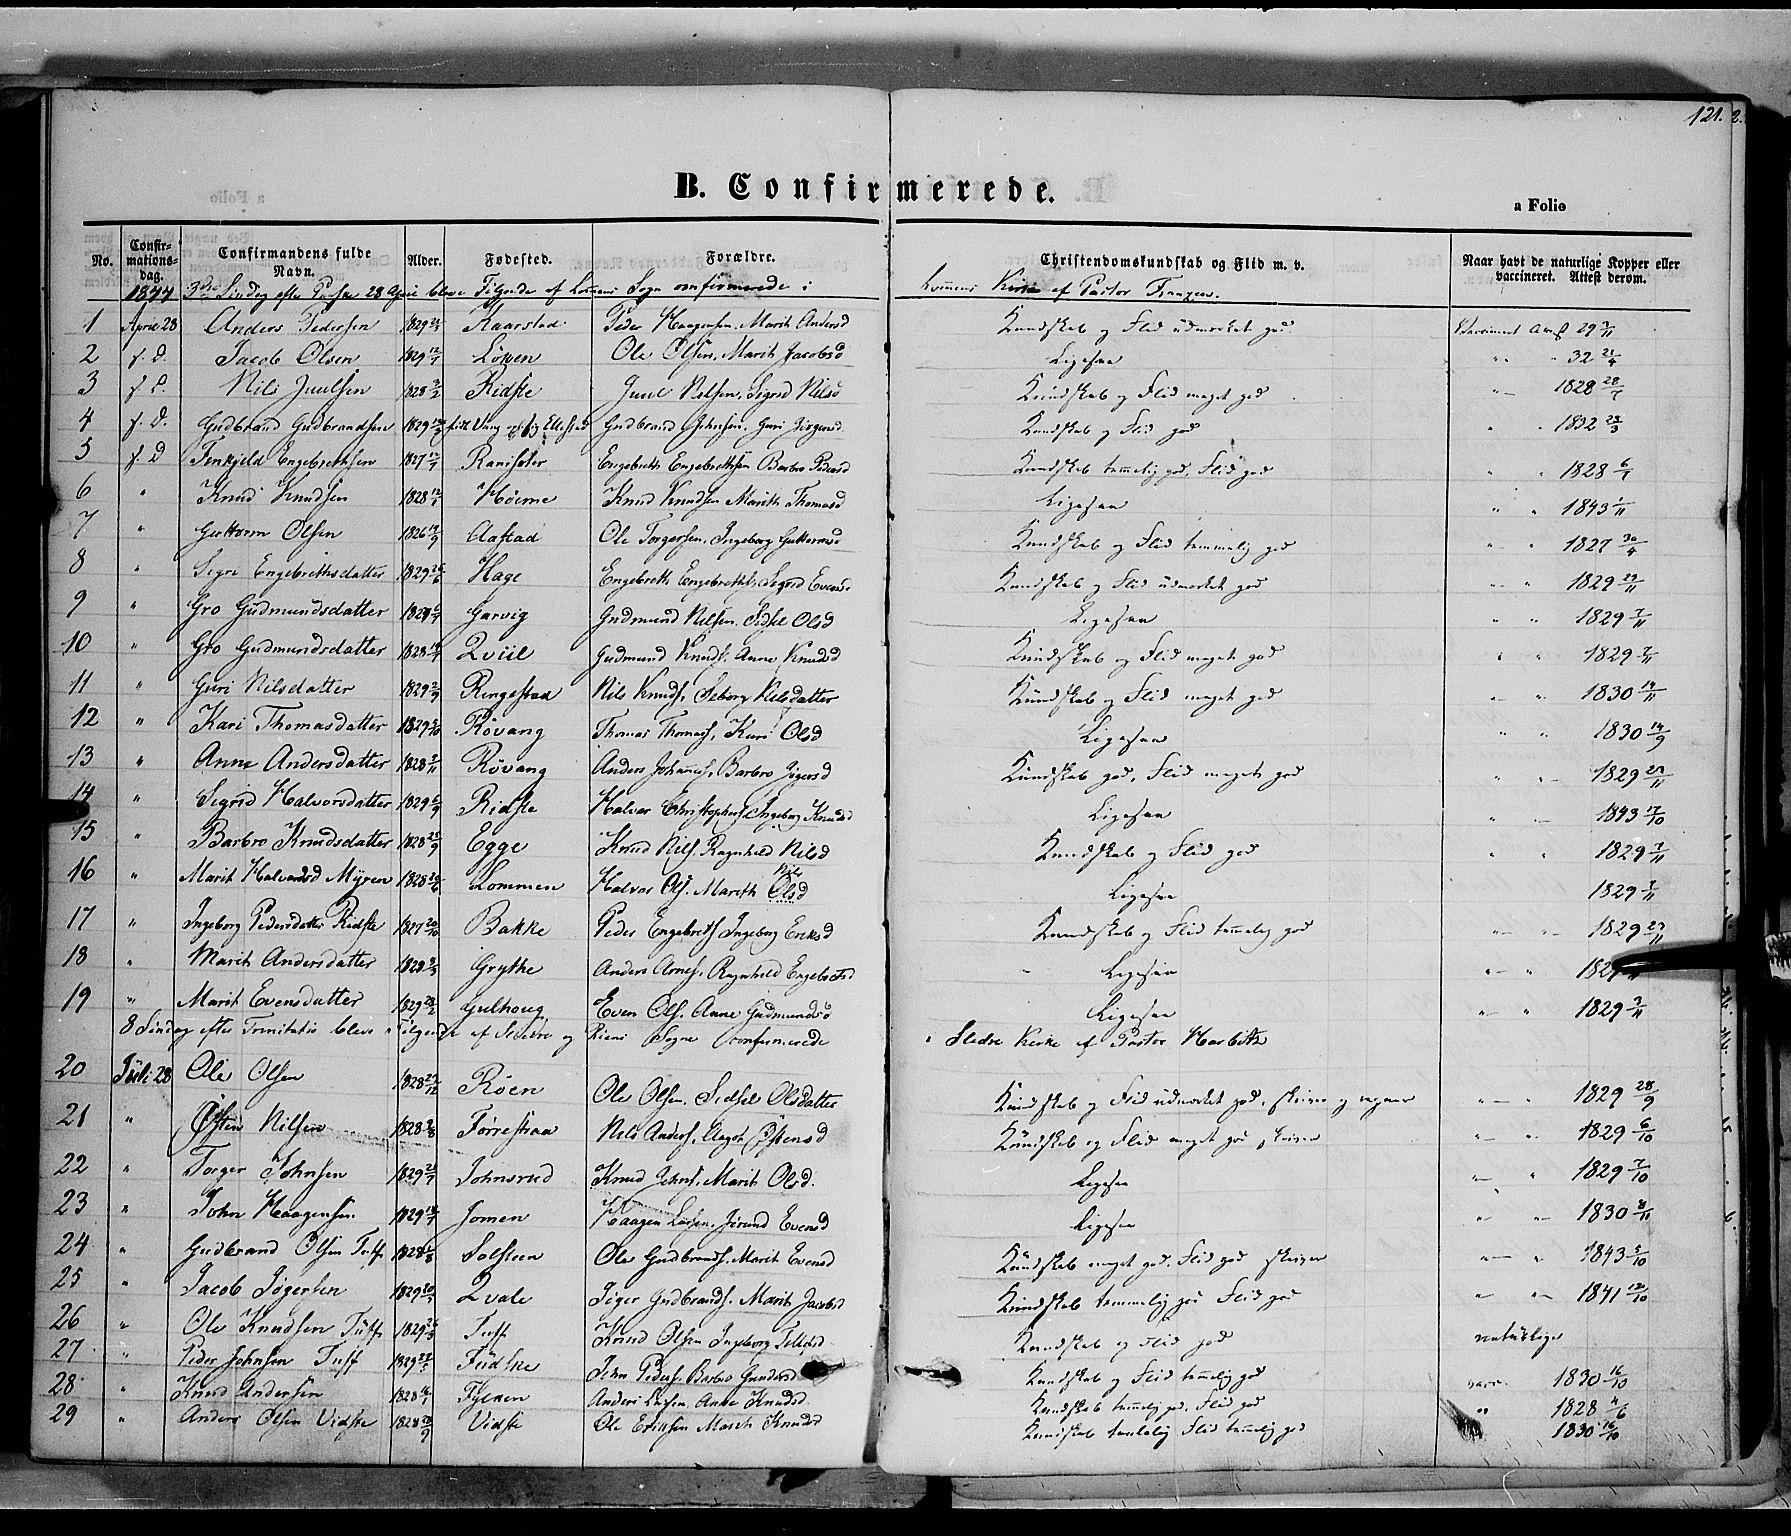 SAH, Vestre Slidre prestekontor, Ministerialbok nr. 1, 1844-1855, s. 121